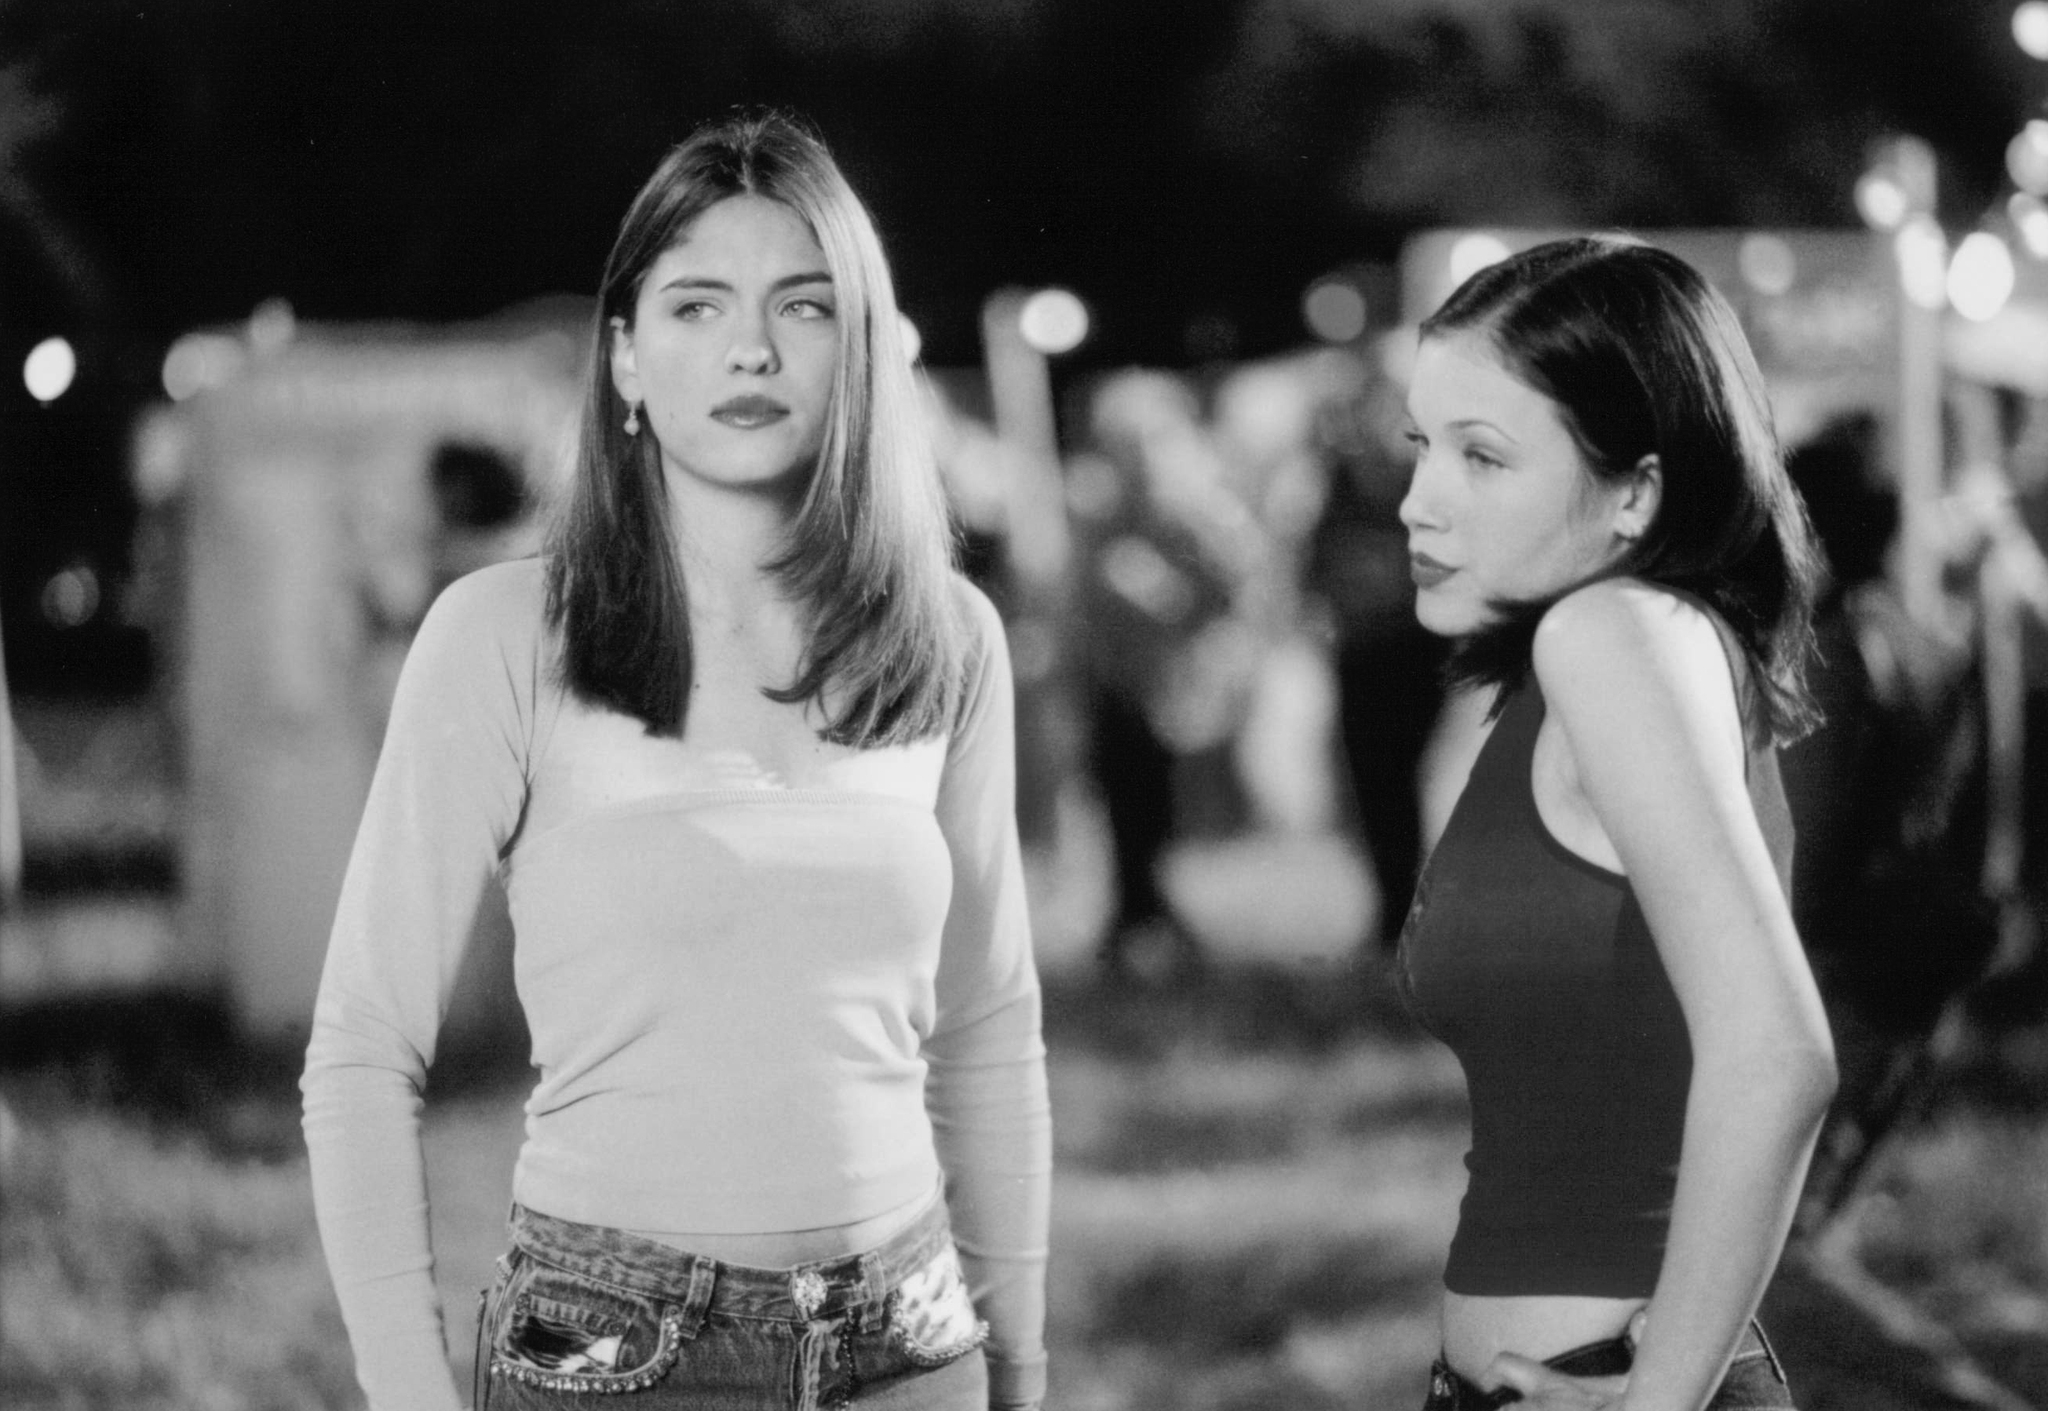 Still of Jodi Lyn O'Keefe and Marla Sokoloff in Whatever It Takes (2000)